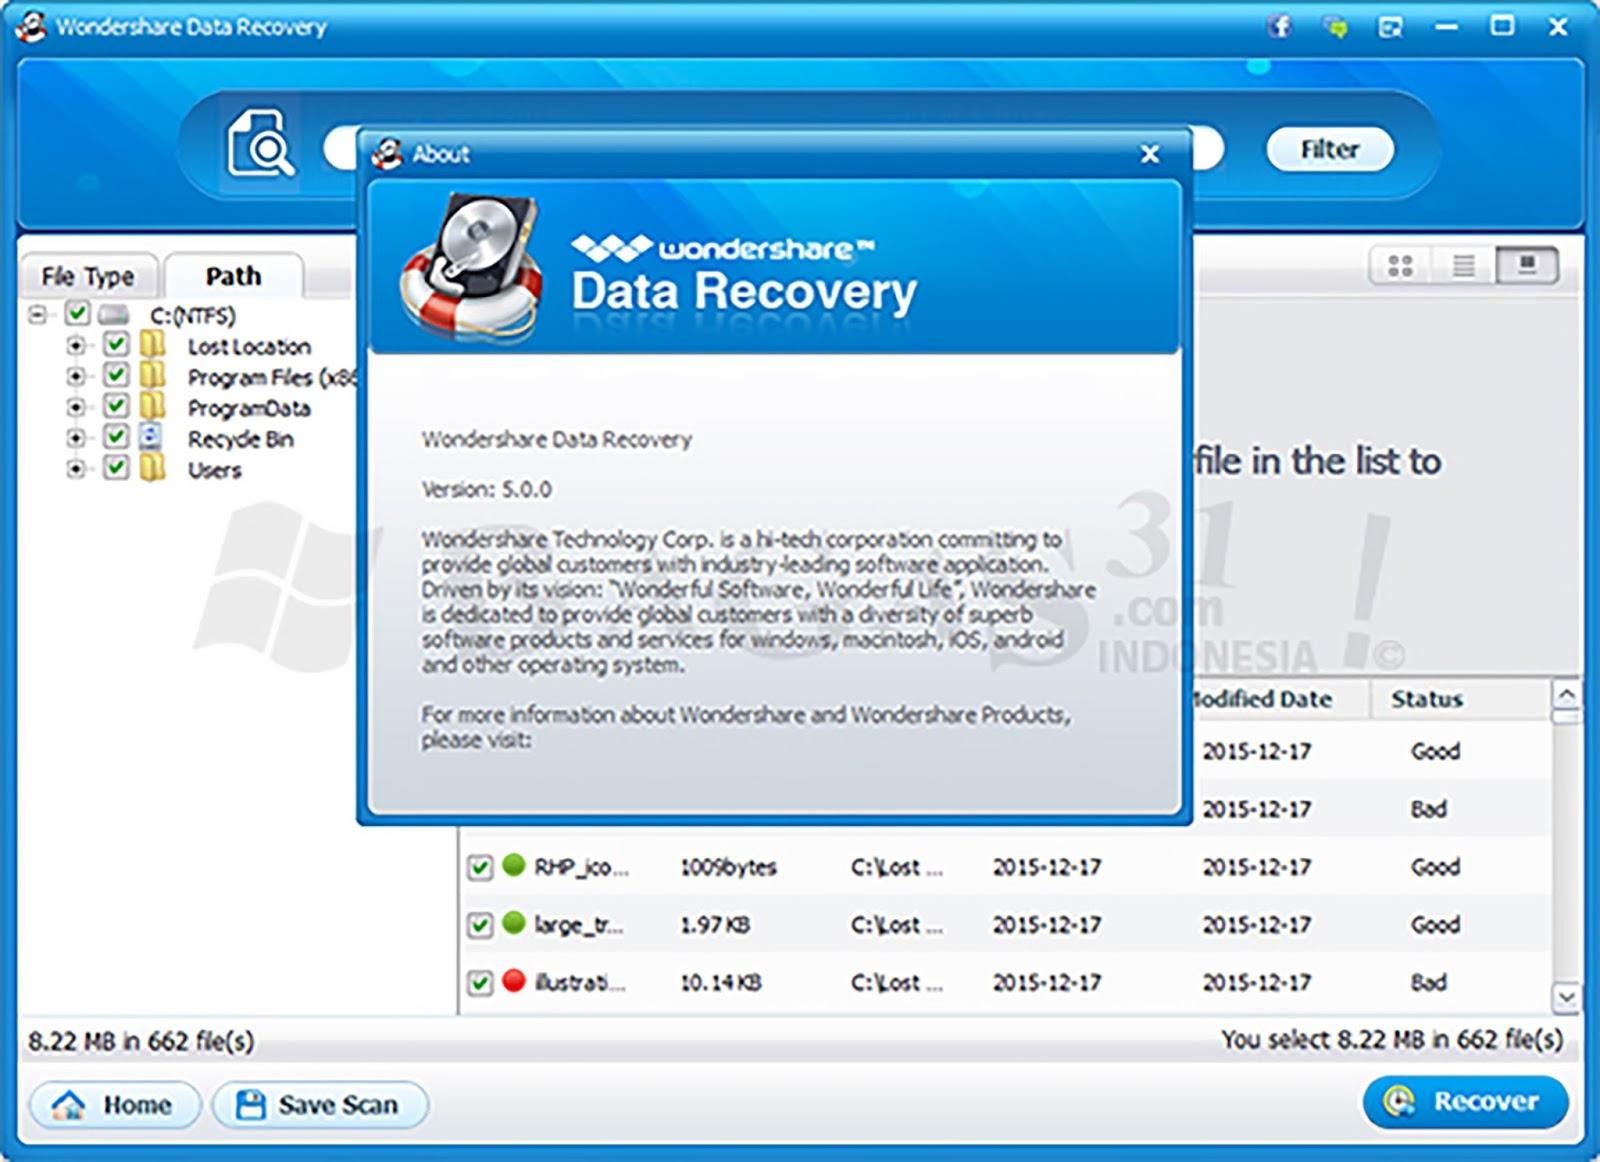 Wondershare Data Recovery Crack Plus Serial Key Download Wondershare photo recovery registration code crack